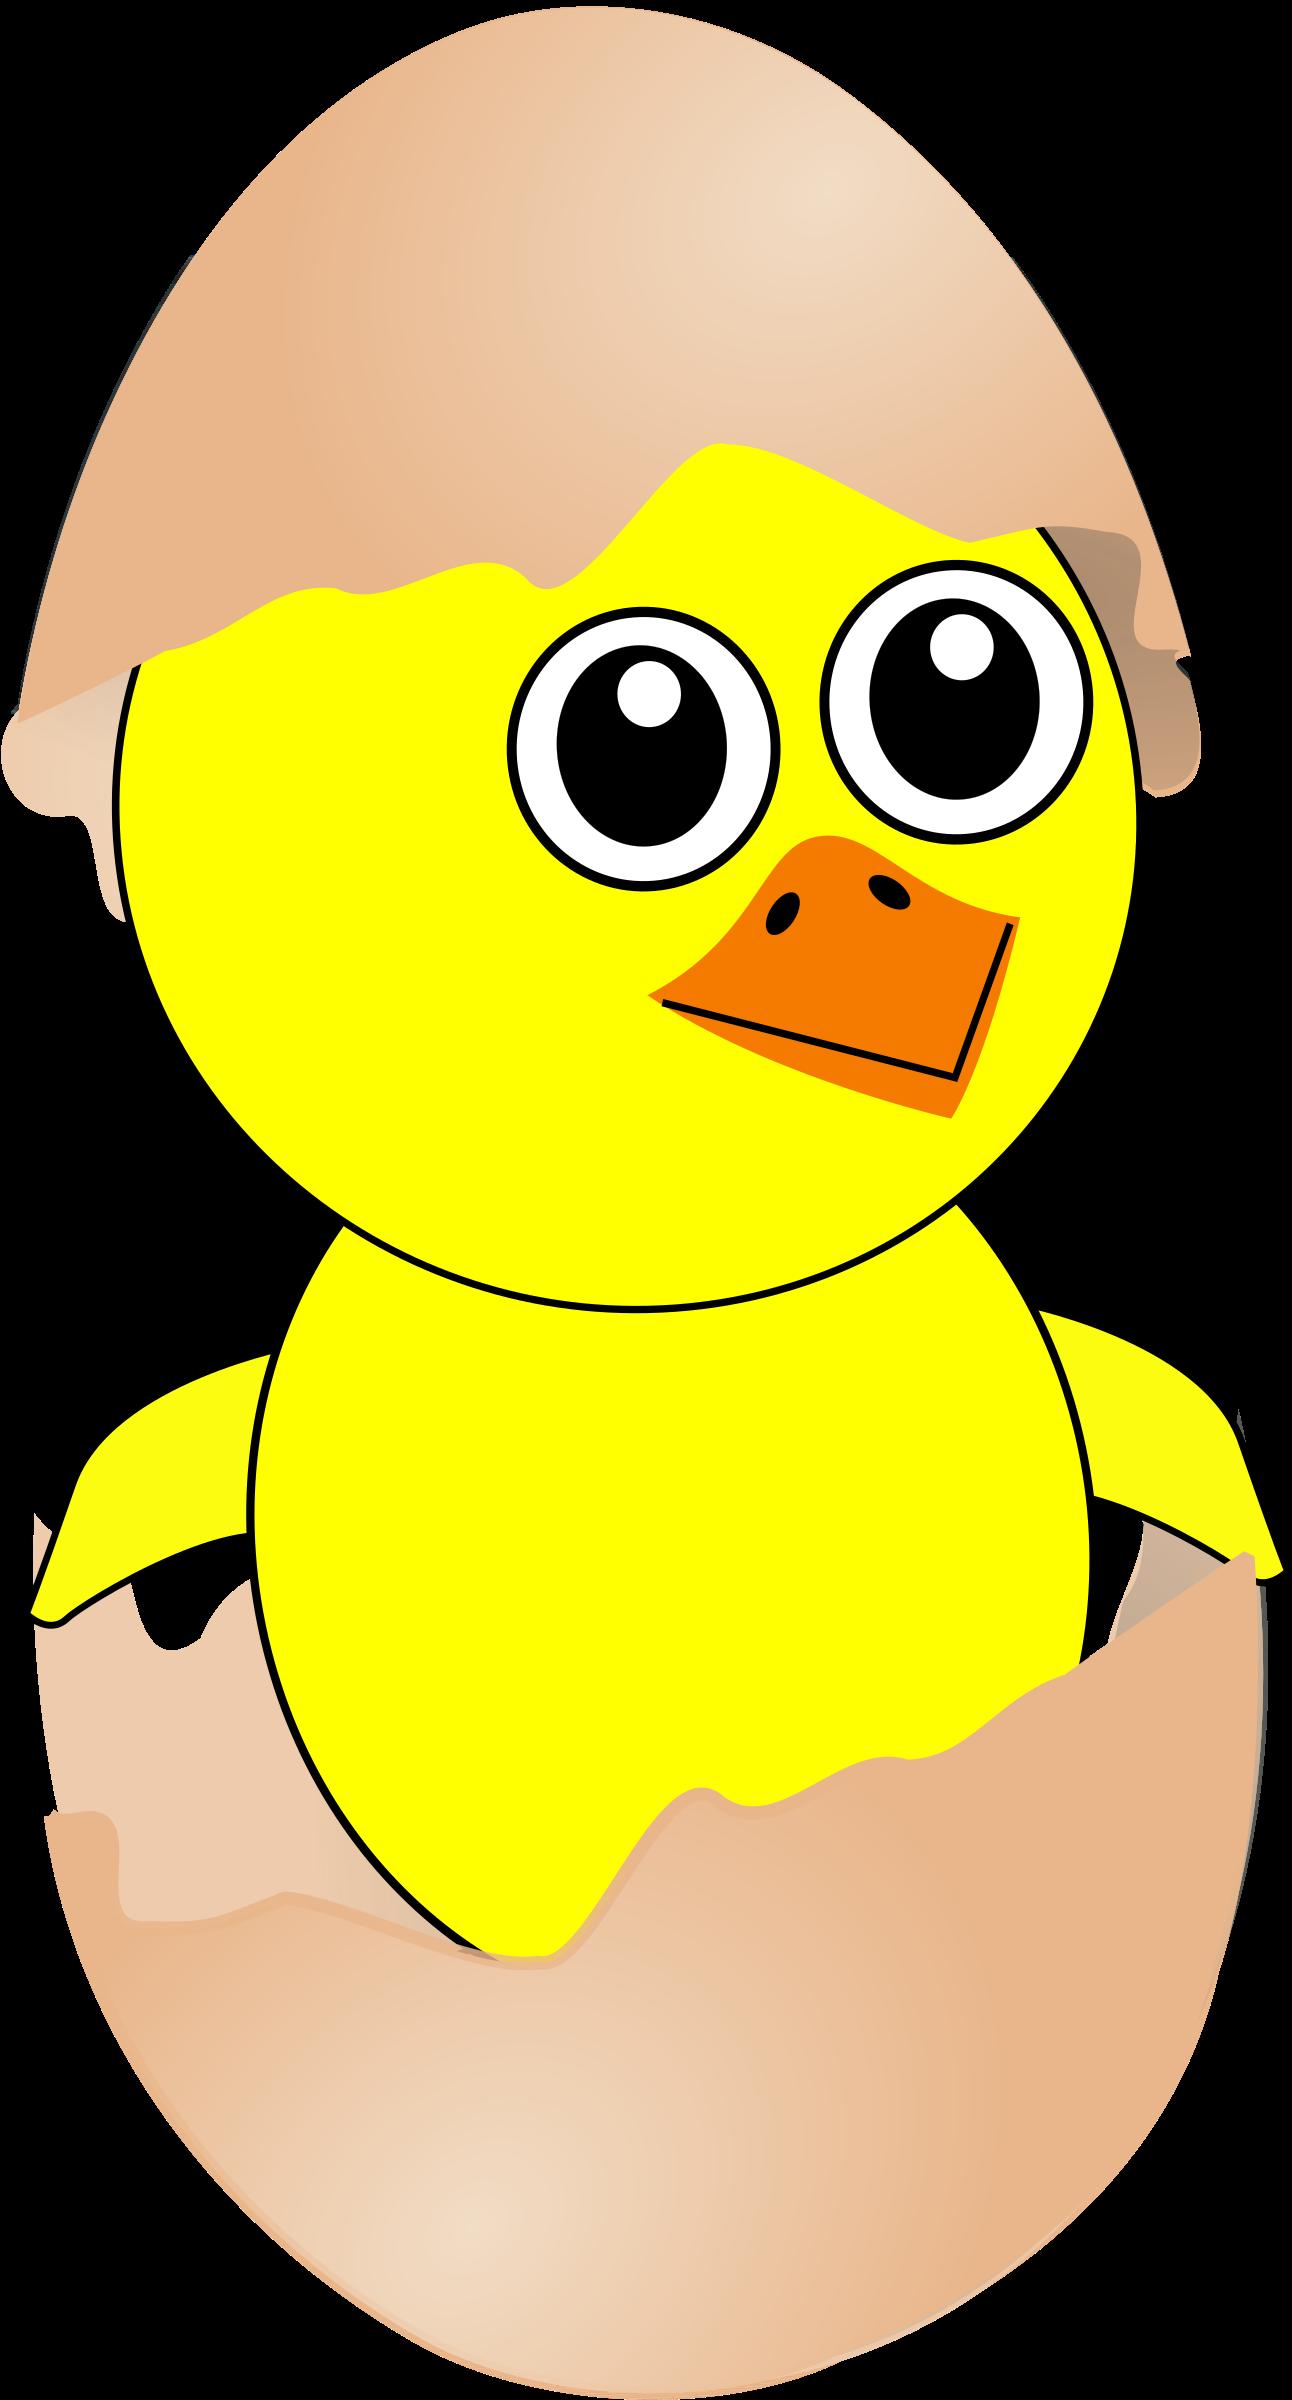 Eggs clipart comic. Funny chick cartoon newborn